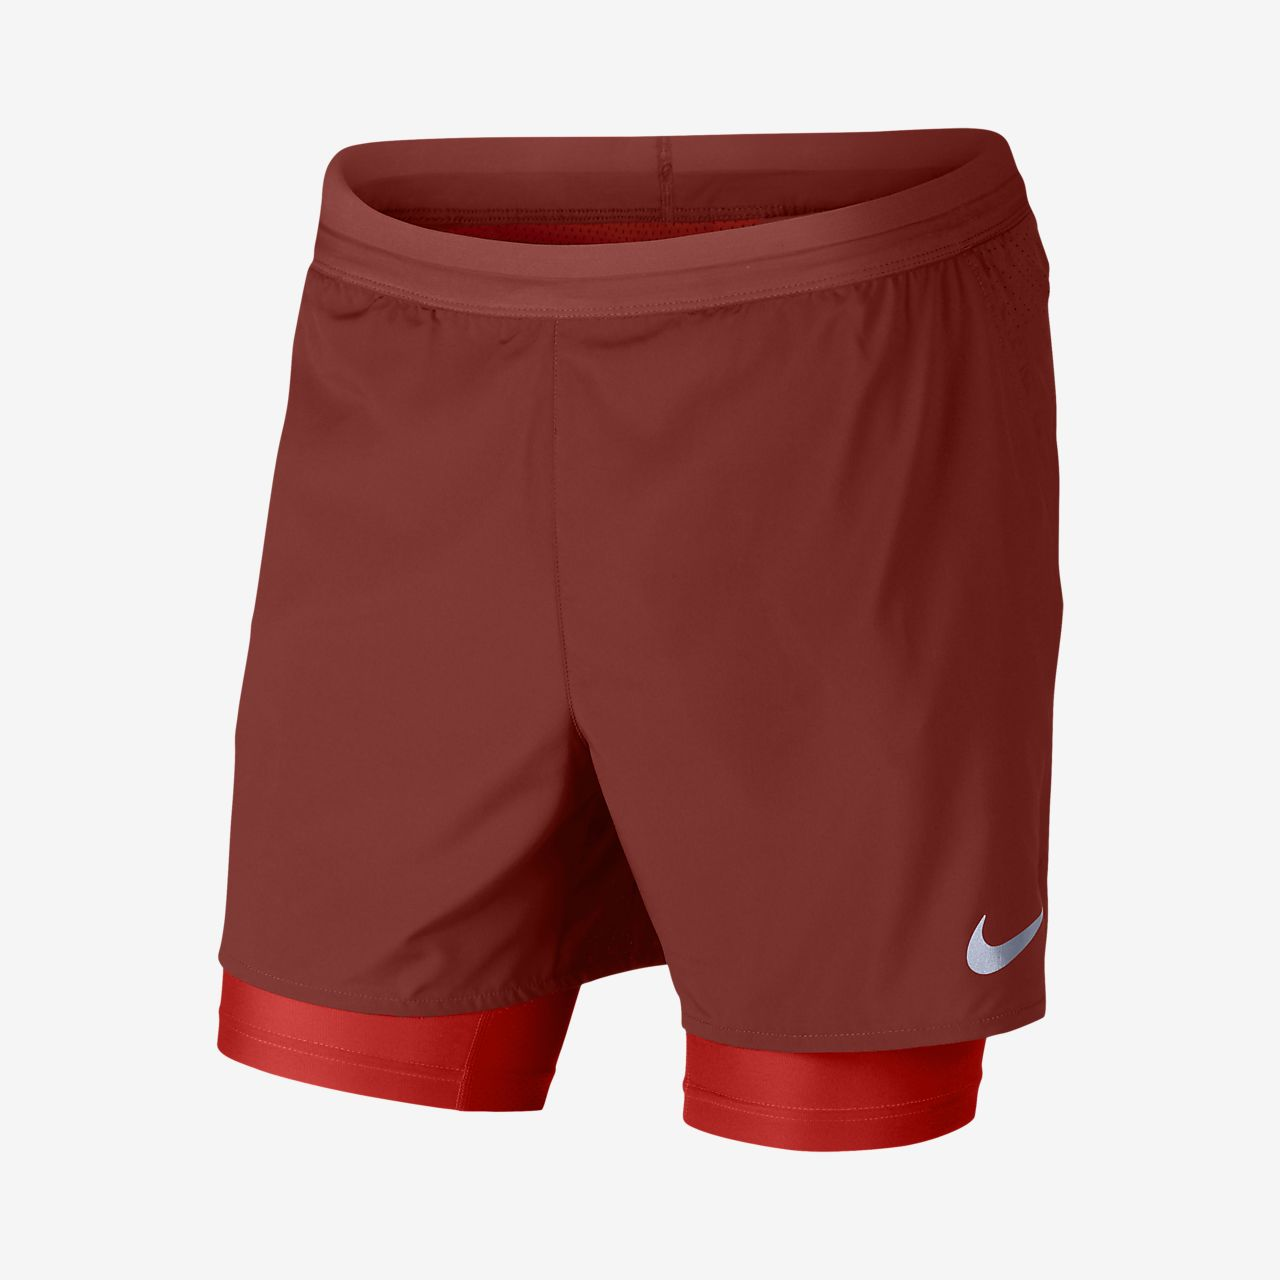 nike shorts 2 in 1 mens